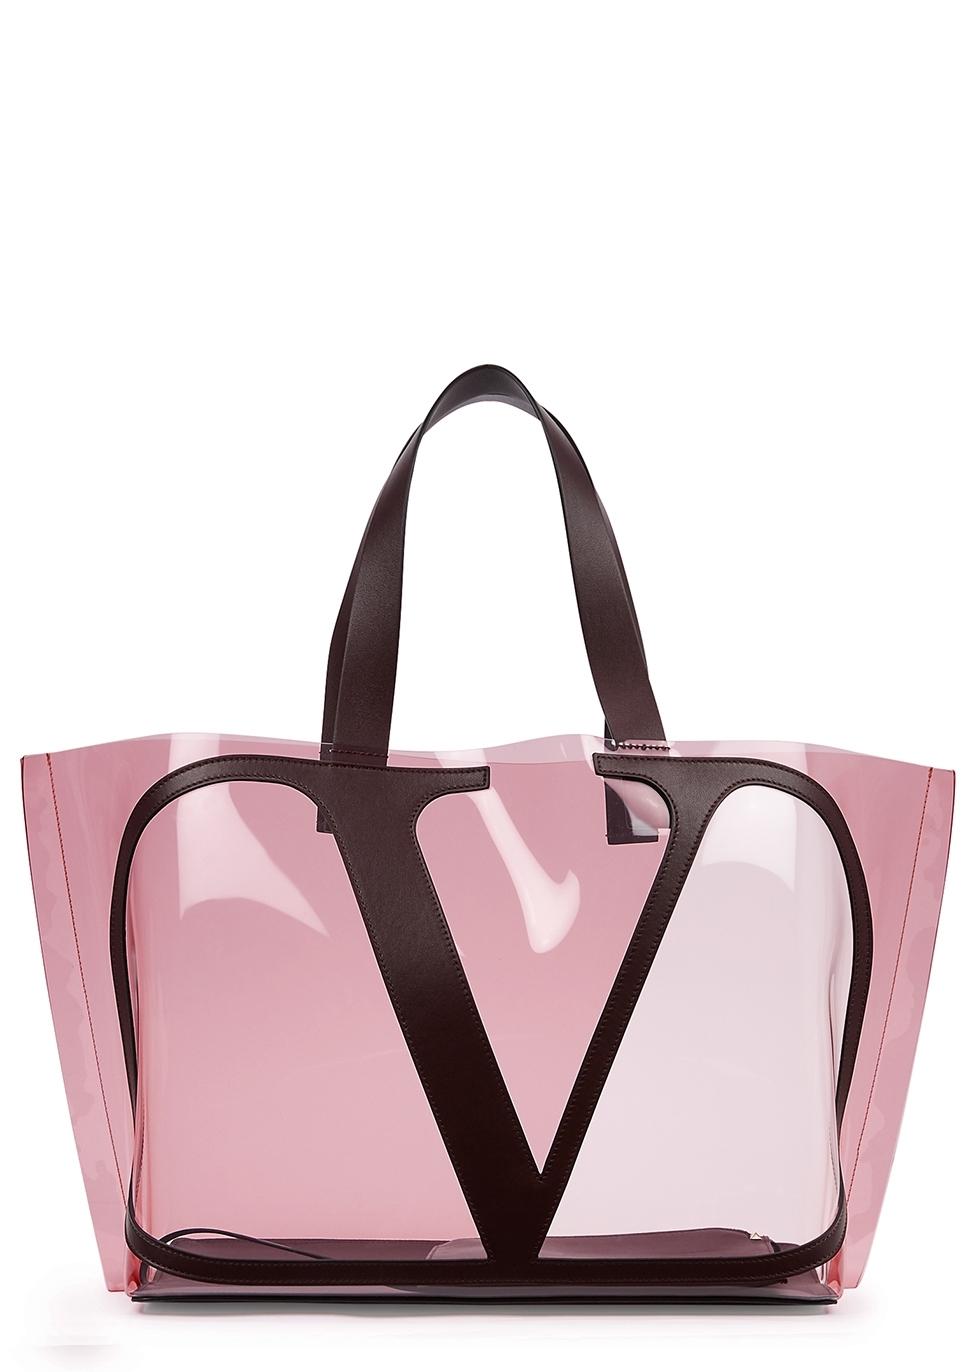 41c04da5ef86 Women's Designer Bags, Handbags and Purses - Harvey Nichols